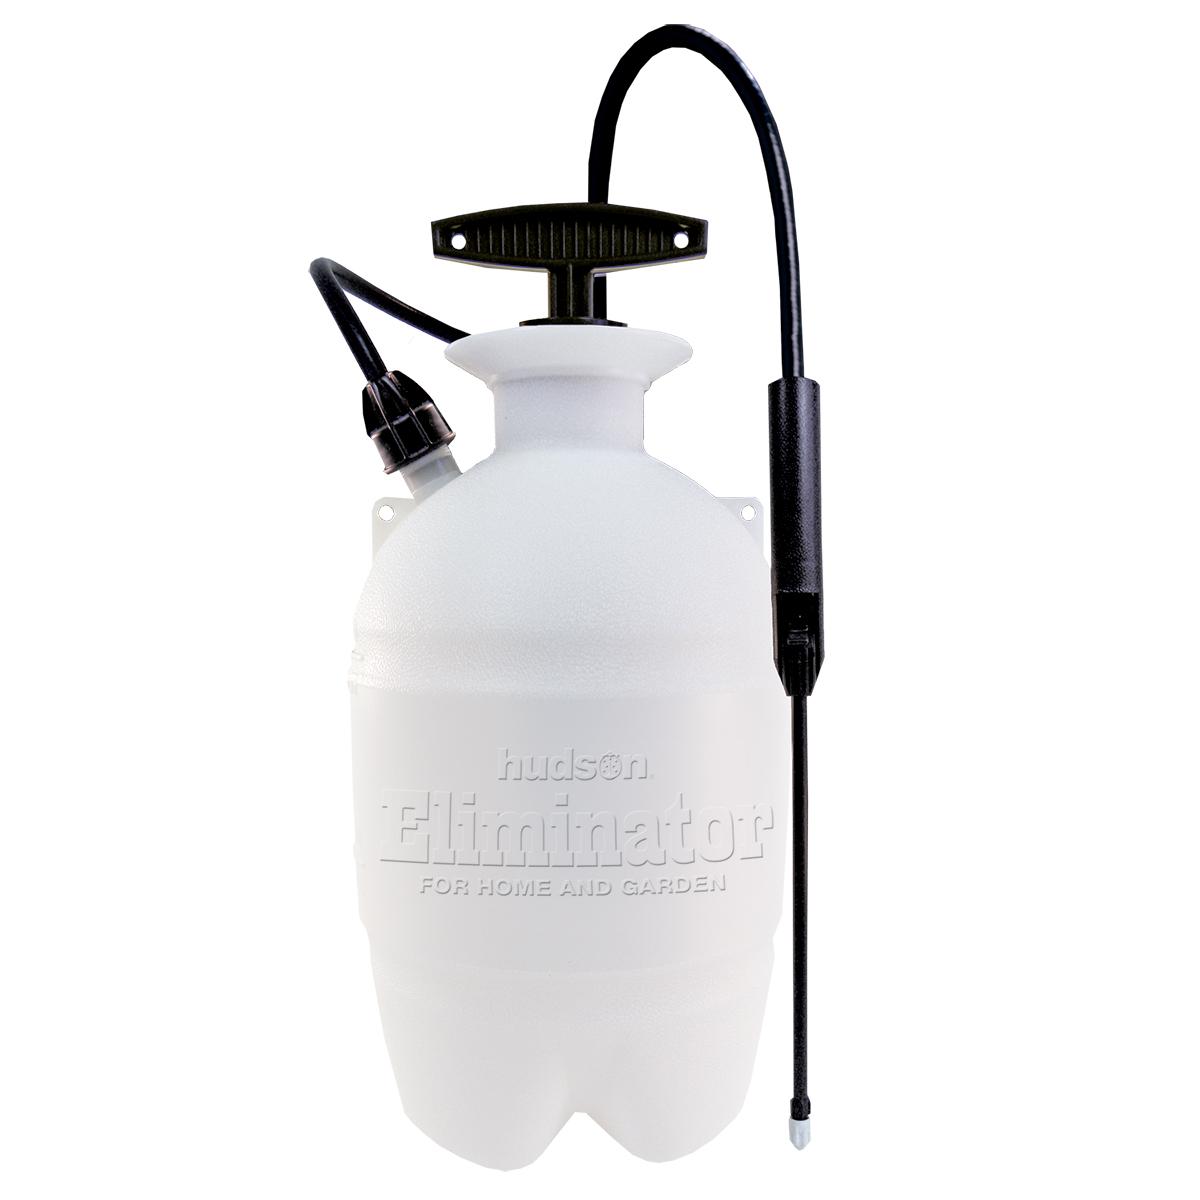 Hudson Portable Atomizer, Indoor/Outdoor